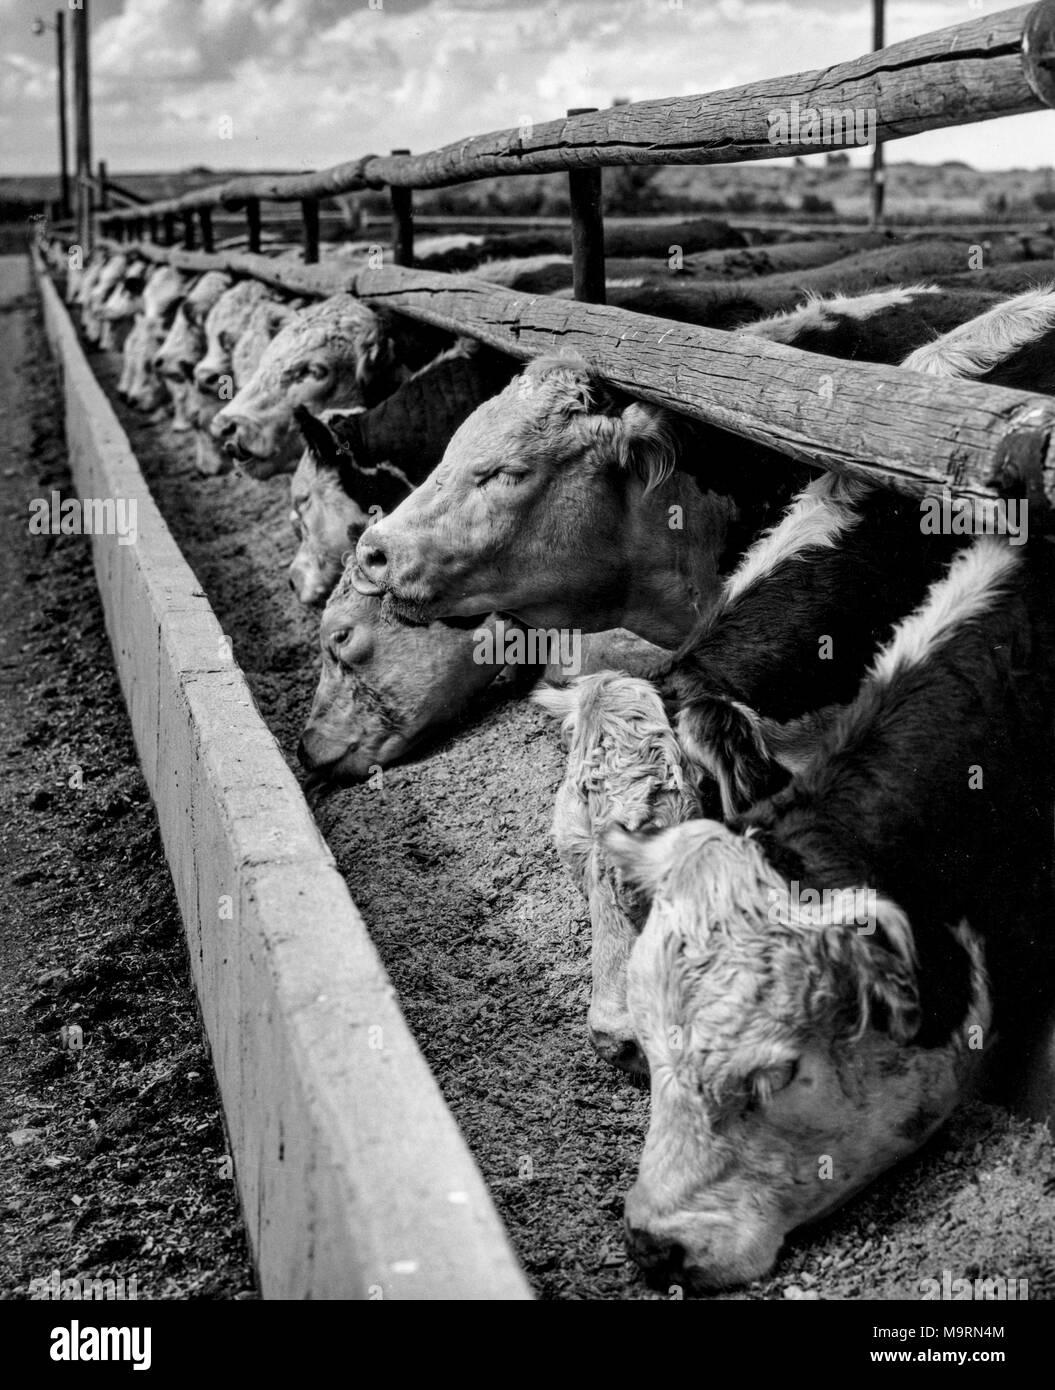 hereford cattle breeding, 70s - Stock Image